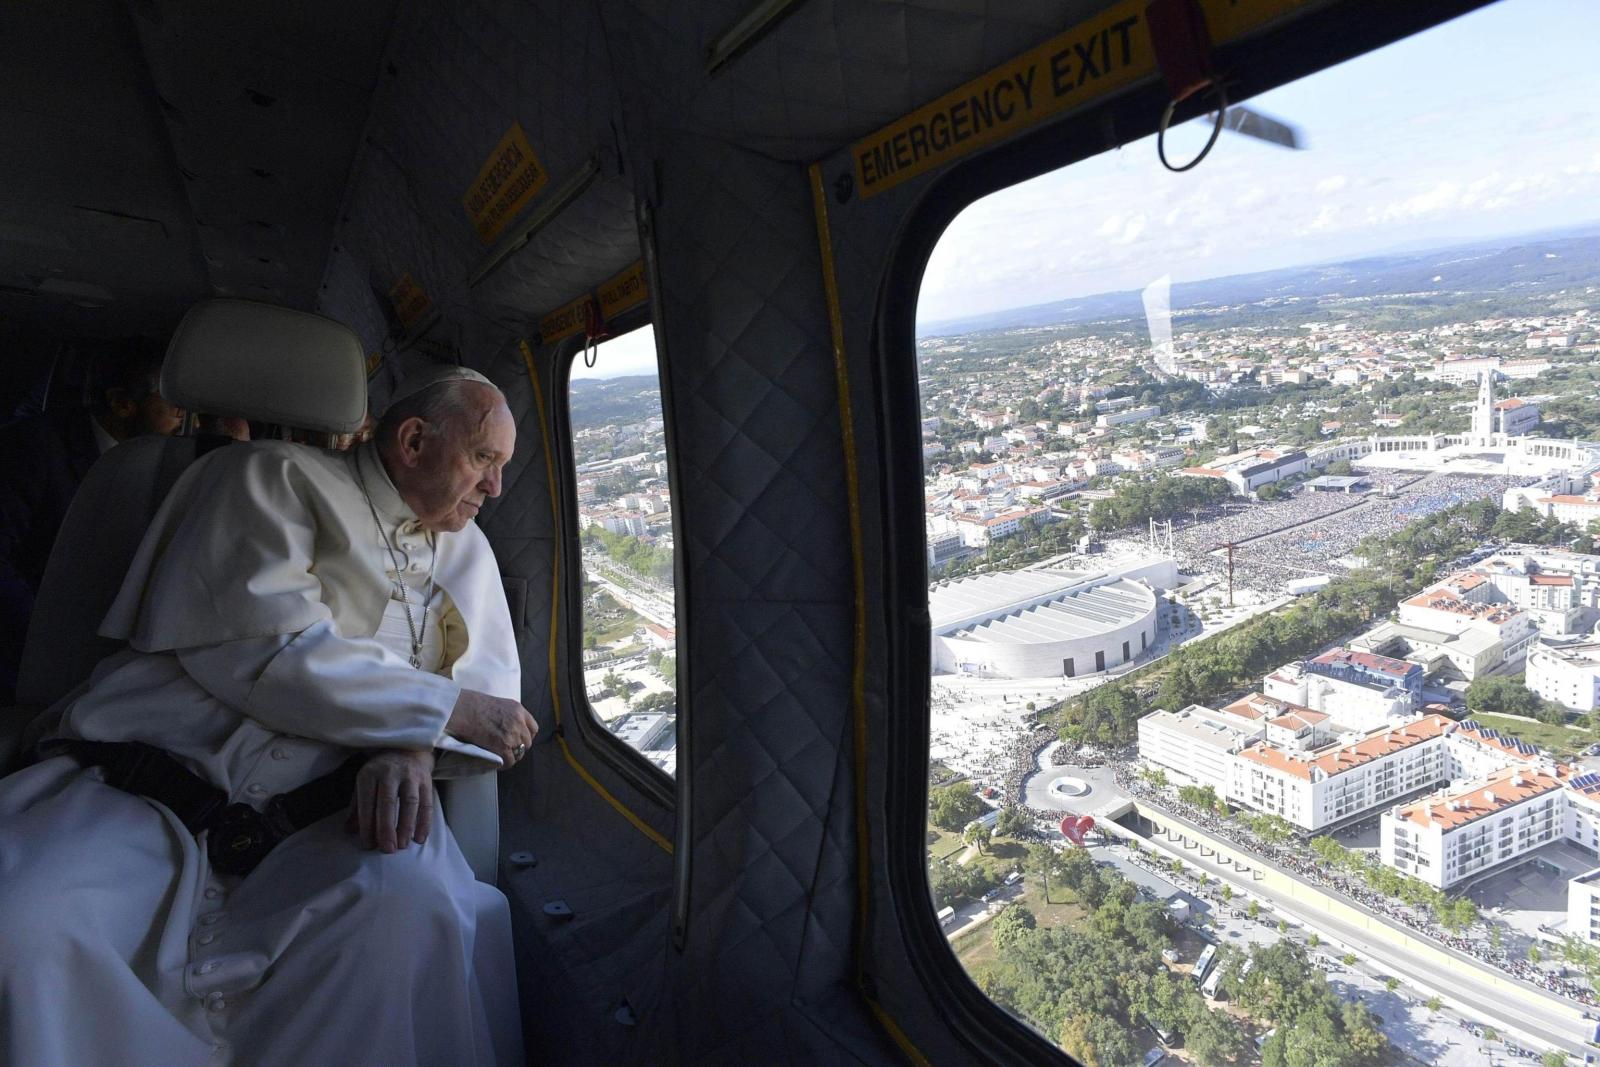 Papież Franciszek w Portugalii. fot. EPA/OSSERVATORE ROMANO